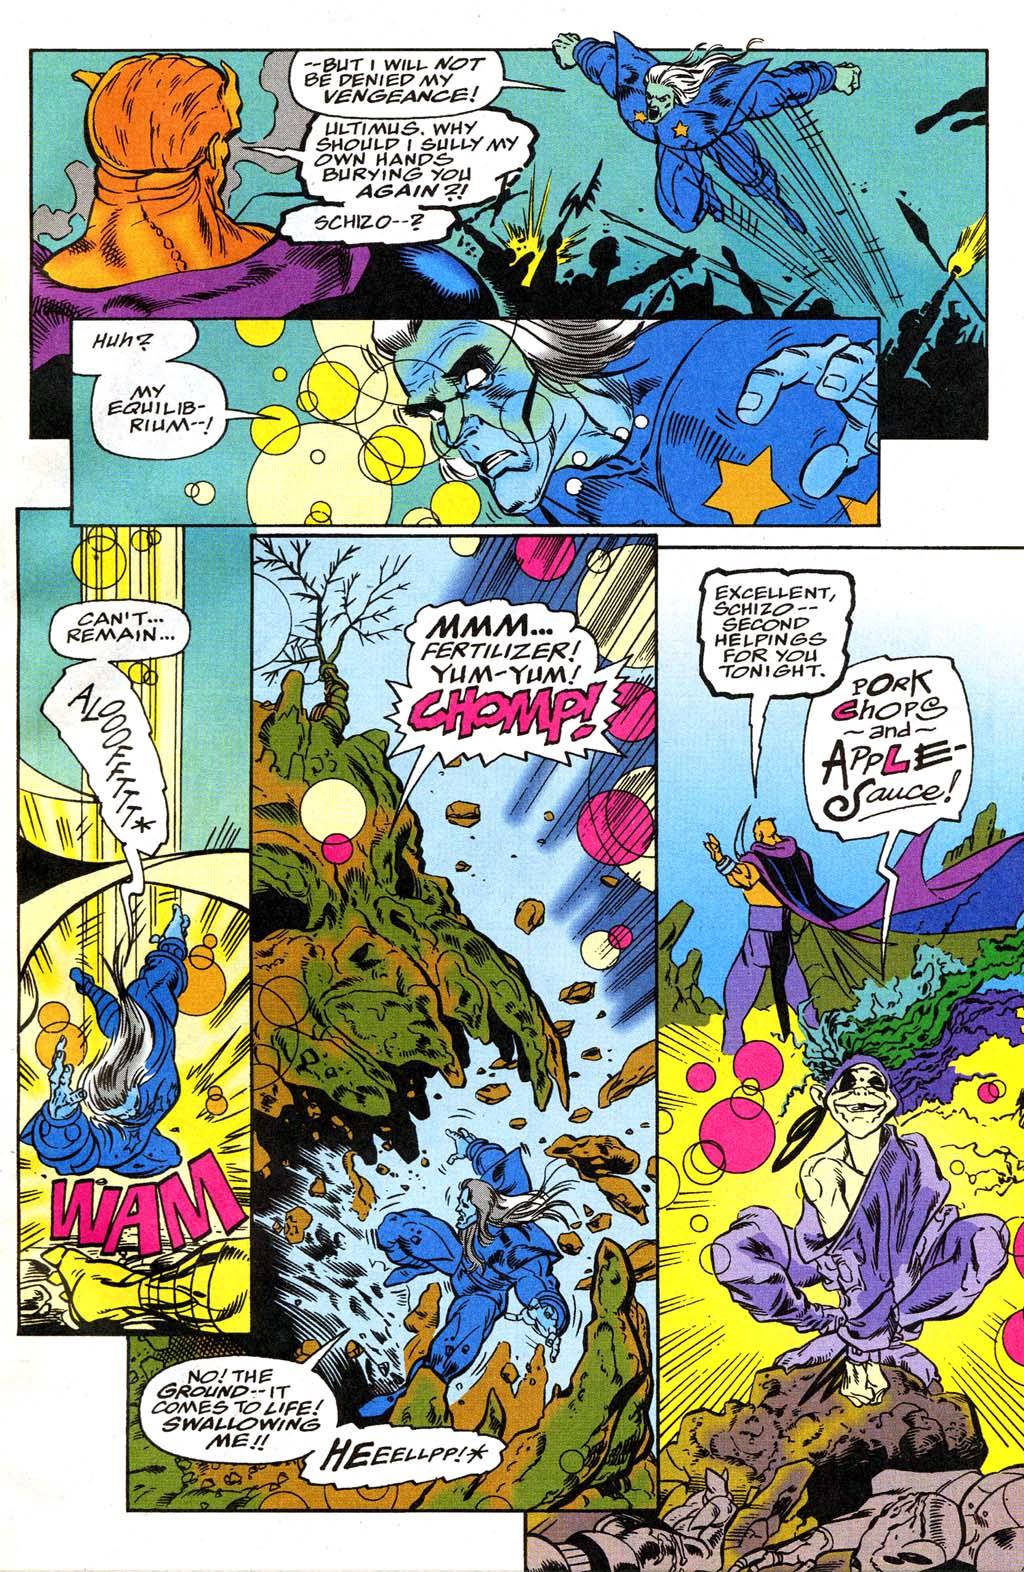 Read online Blackwulf comic -  Issue #8 - 15